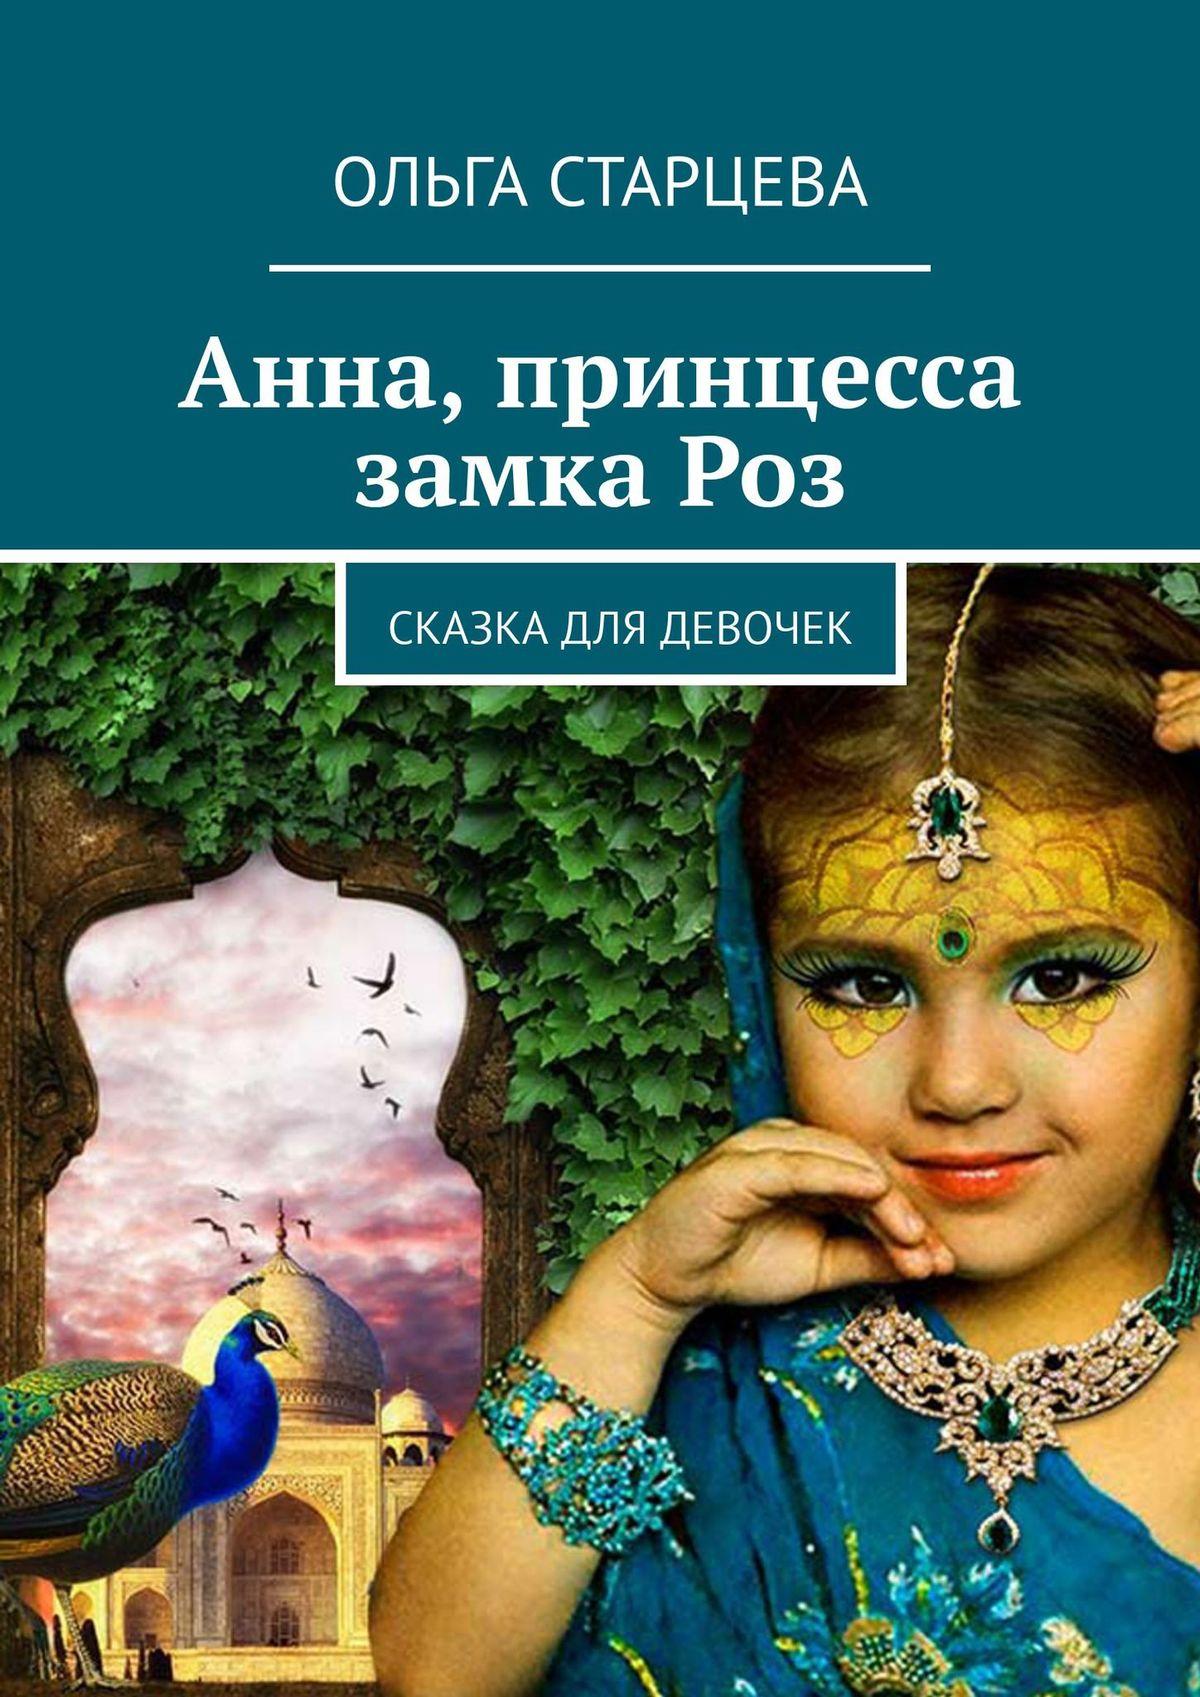 Ольга Старцева Анна, принцесса замкаРоз